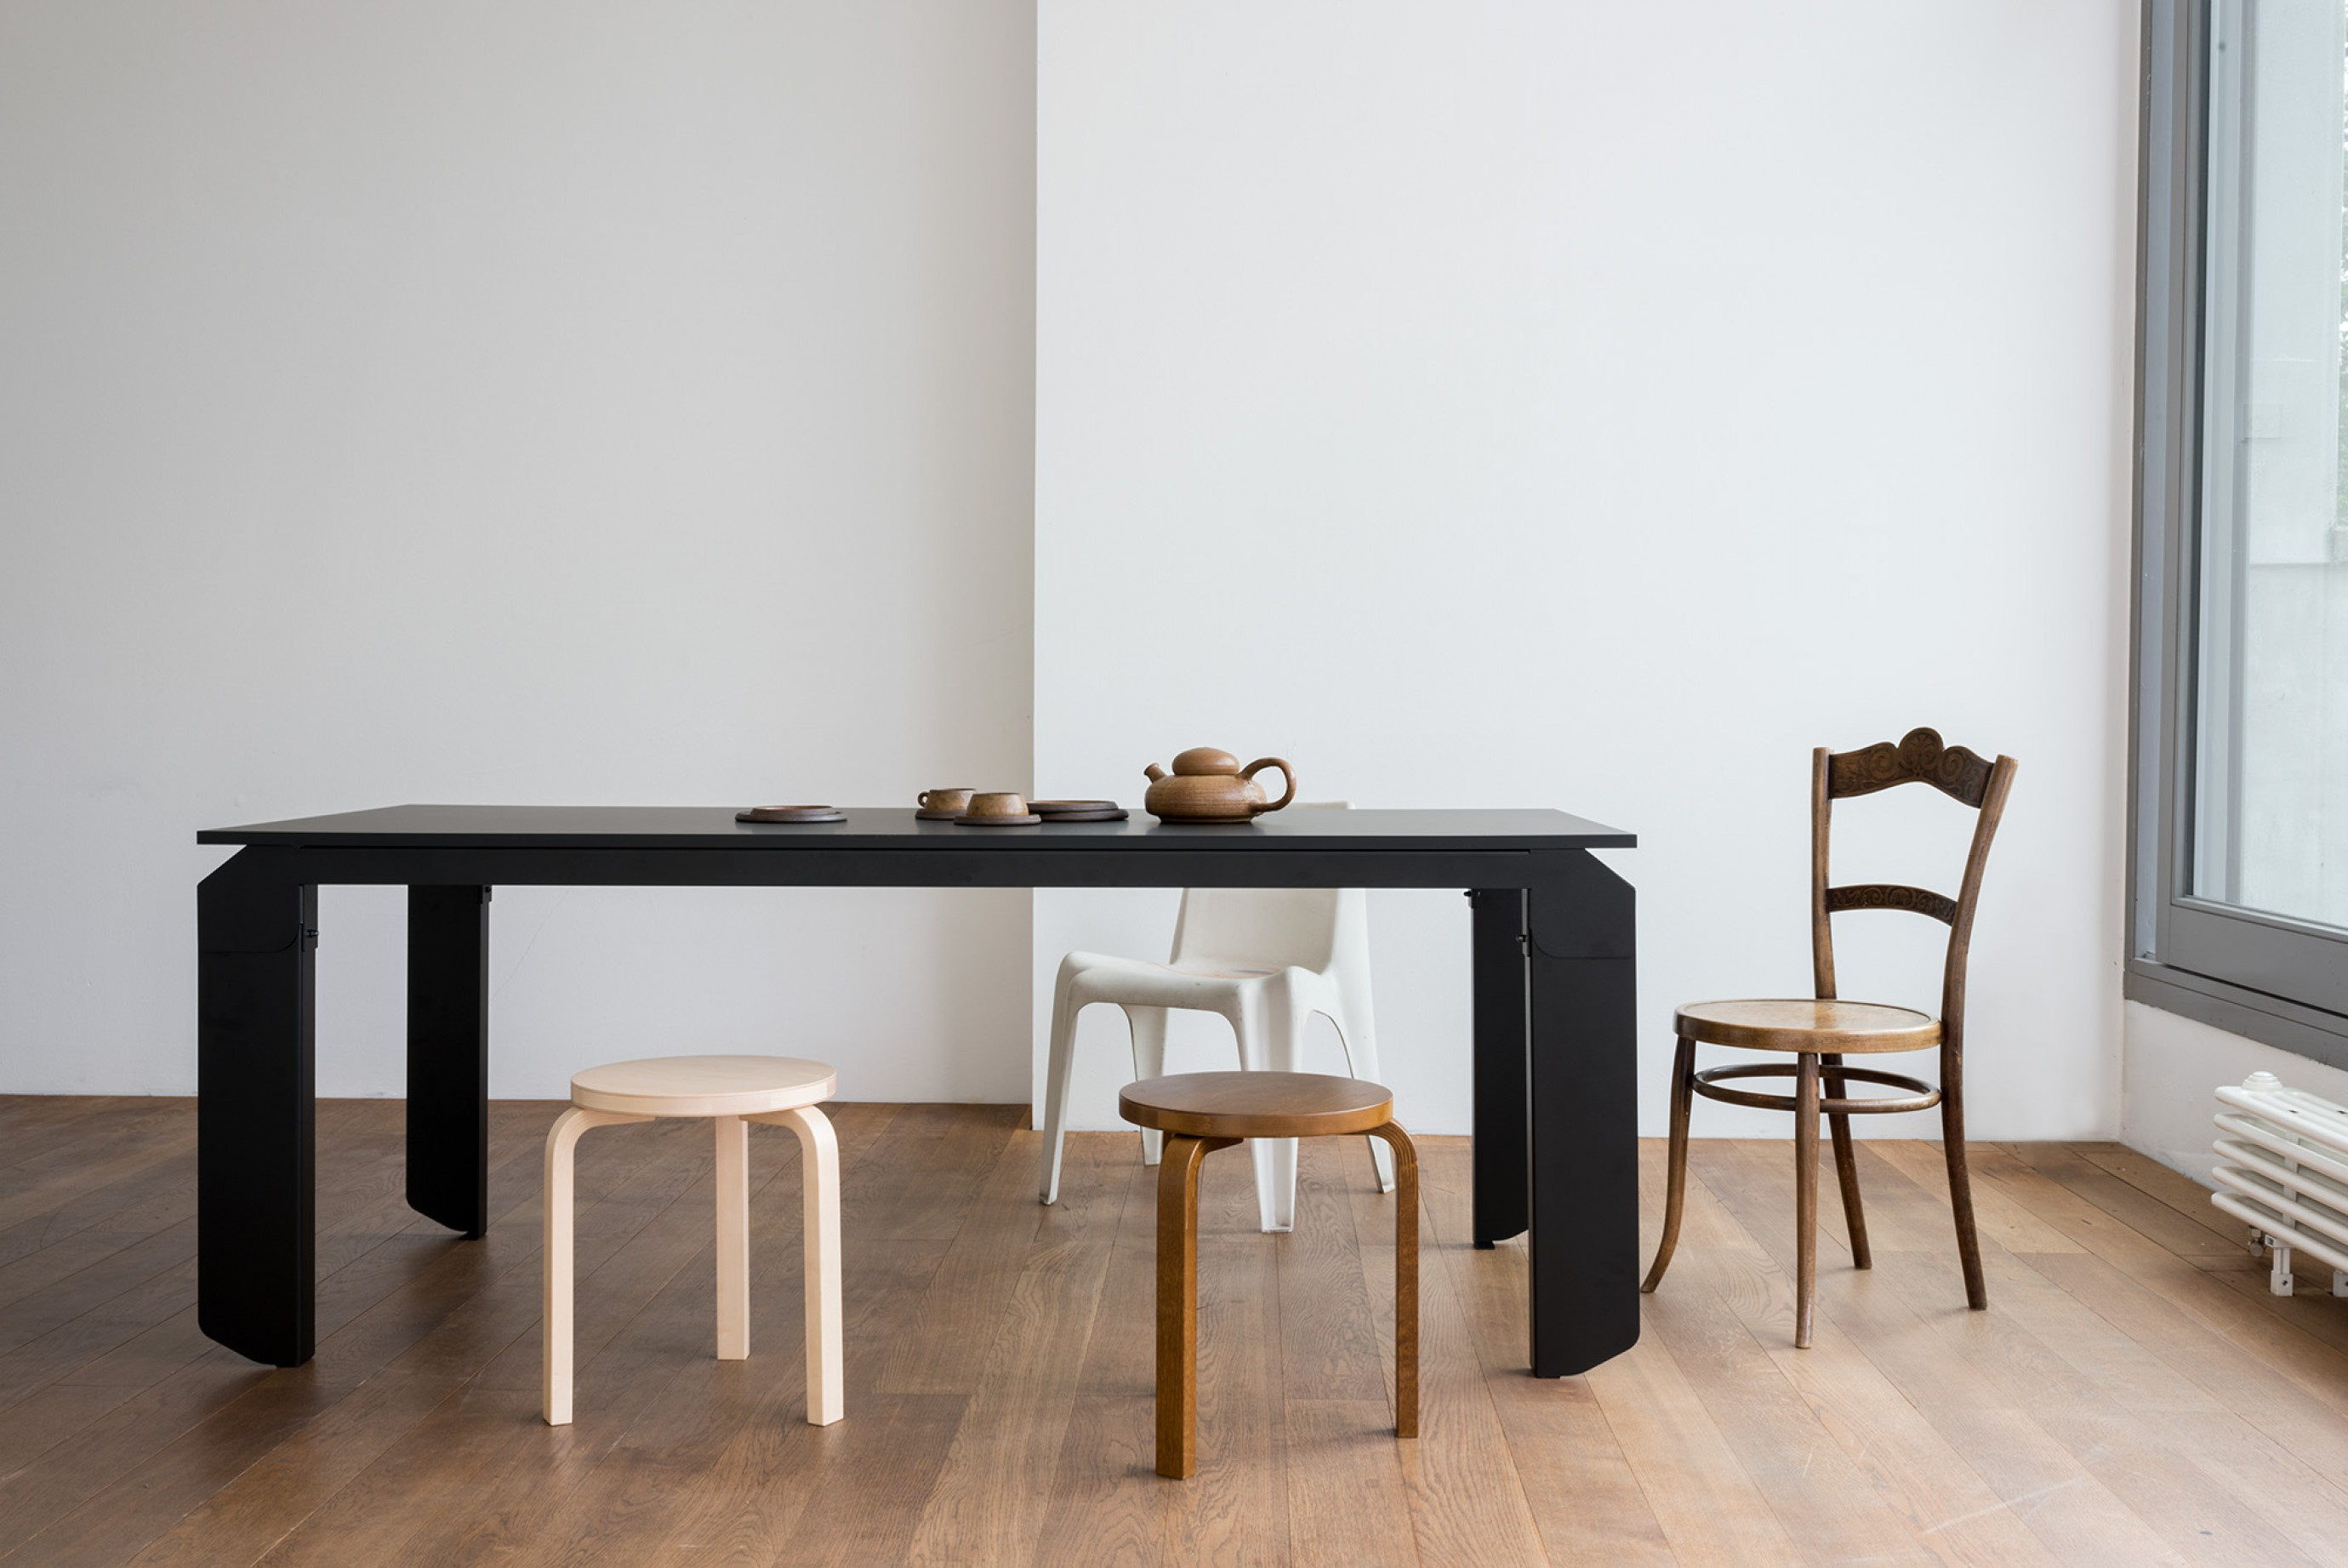 Novak Table: kortom in te zetten in elk project Victors Design Agency